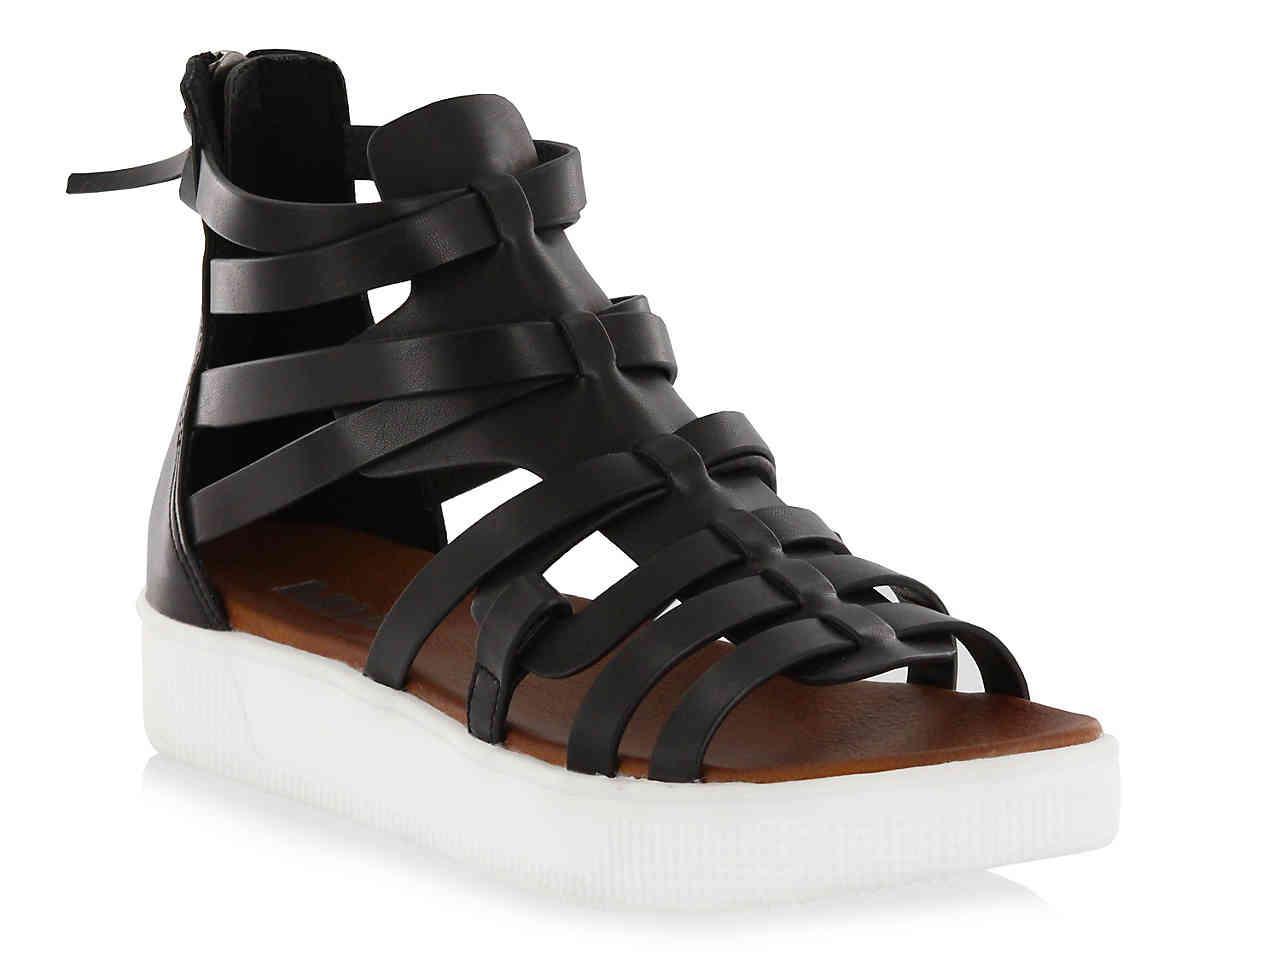 ceb2c741eb1 Lyst - MIA Elsie Gladiator Sandal in Black